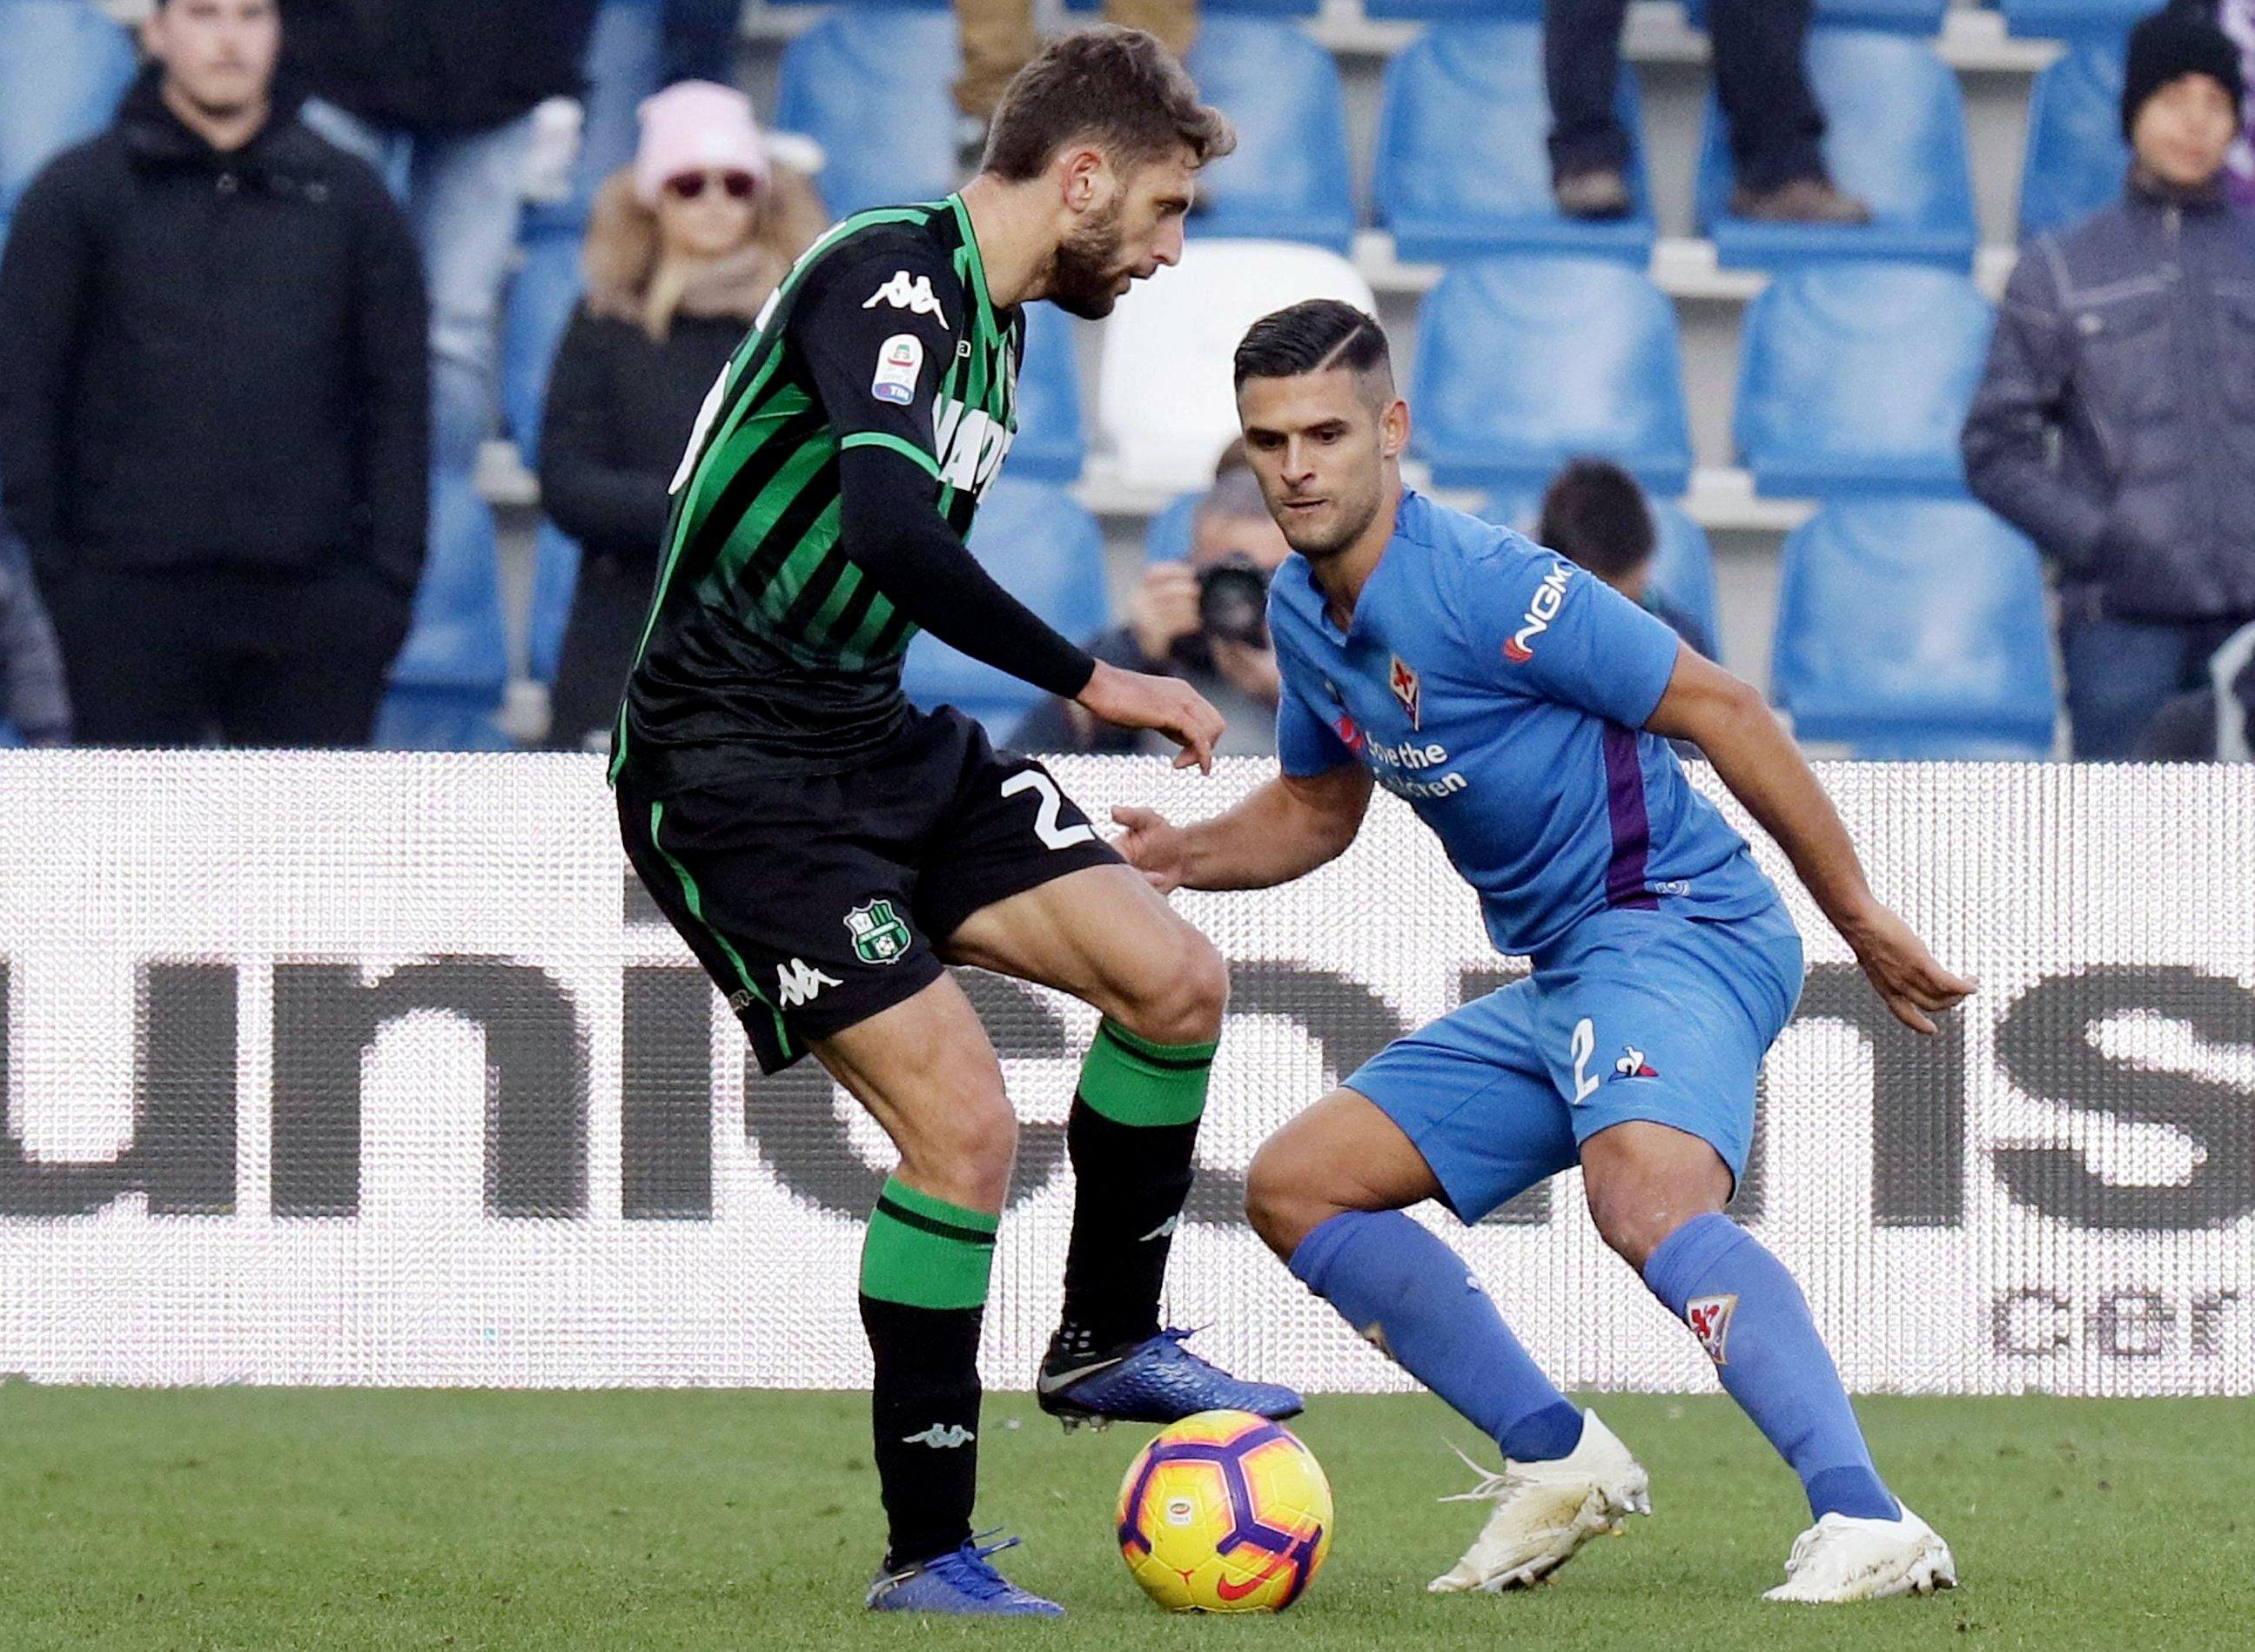 Mirallas scores late as Fiorentina draws 3-3 at Sassuolo